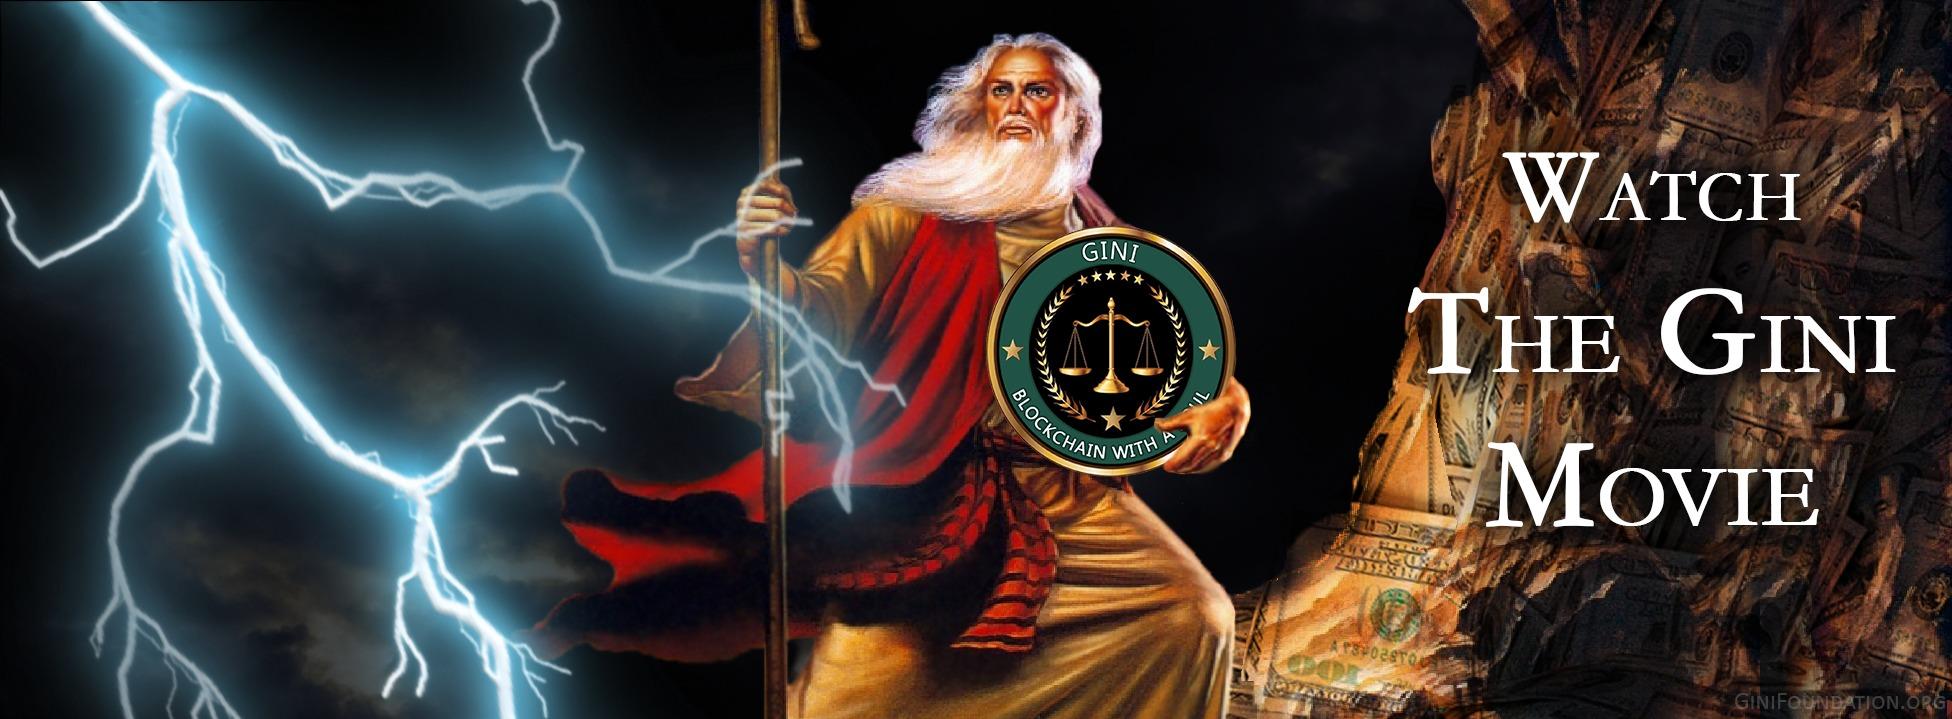 crypto-wise-man-ginifoundation.org